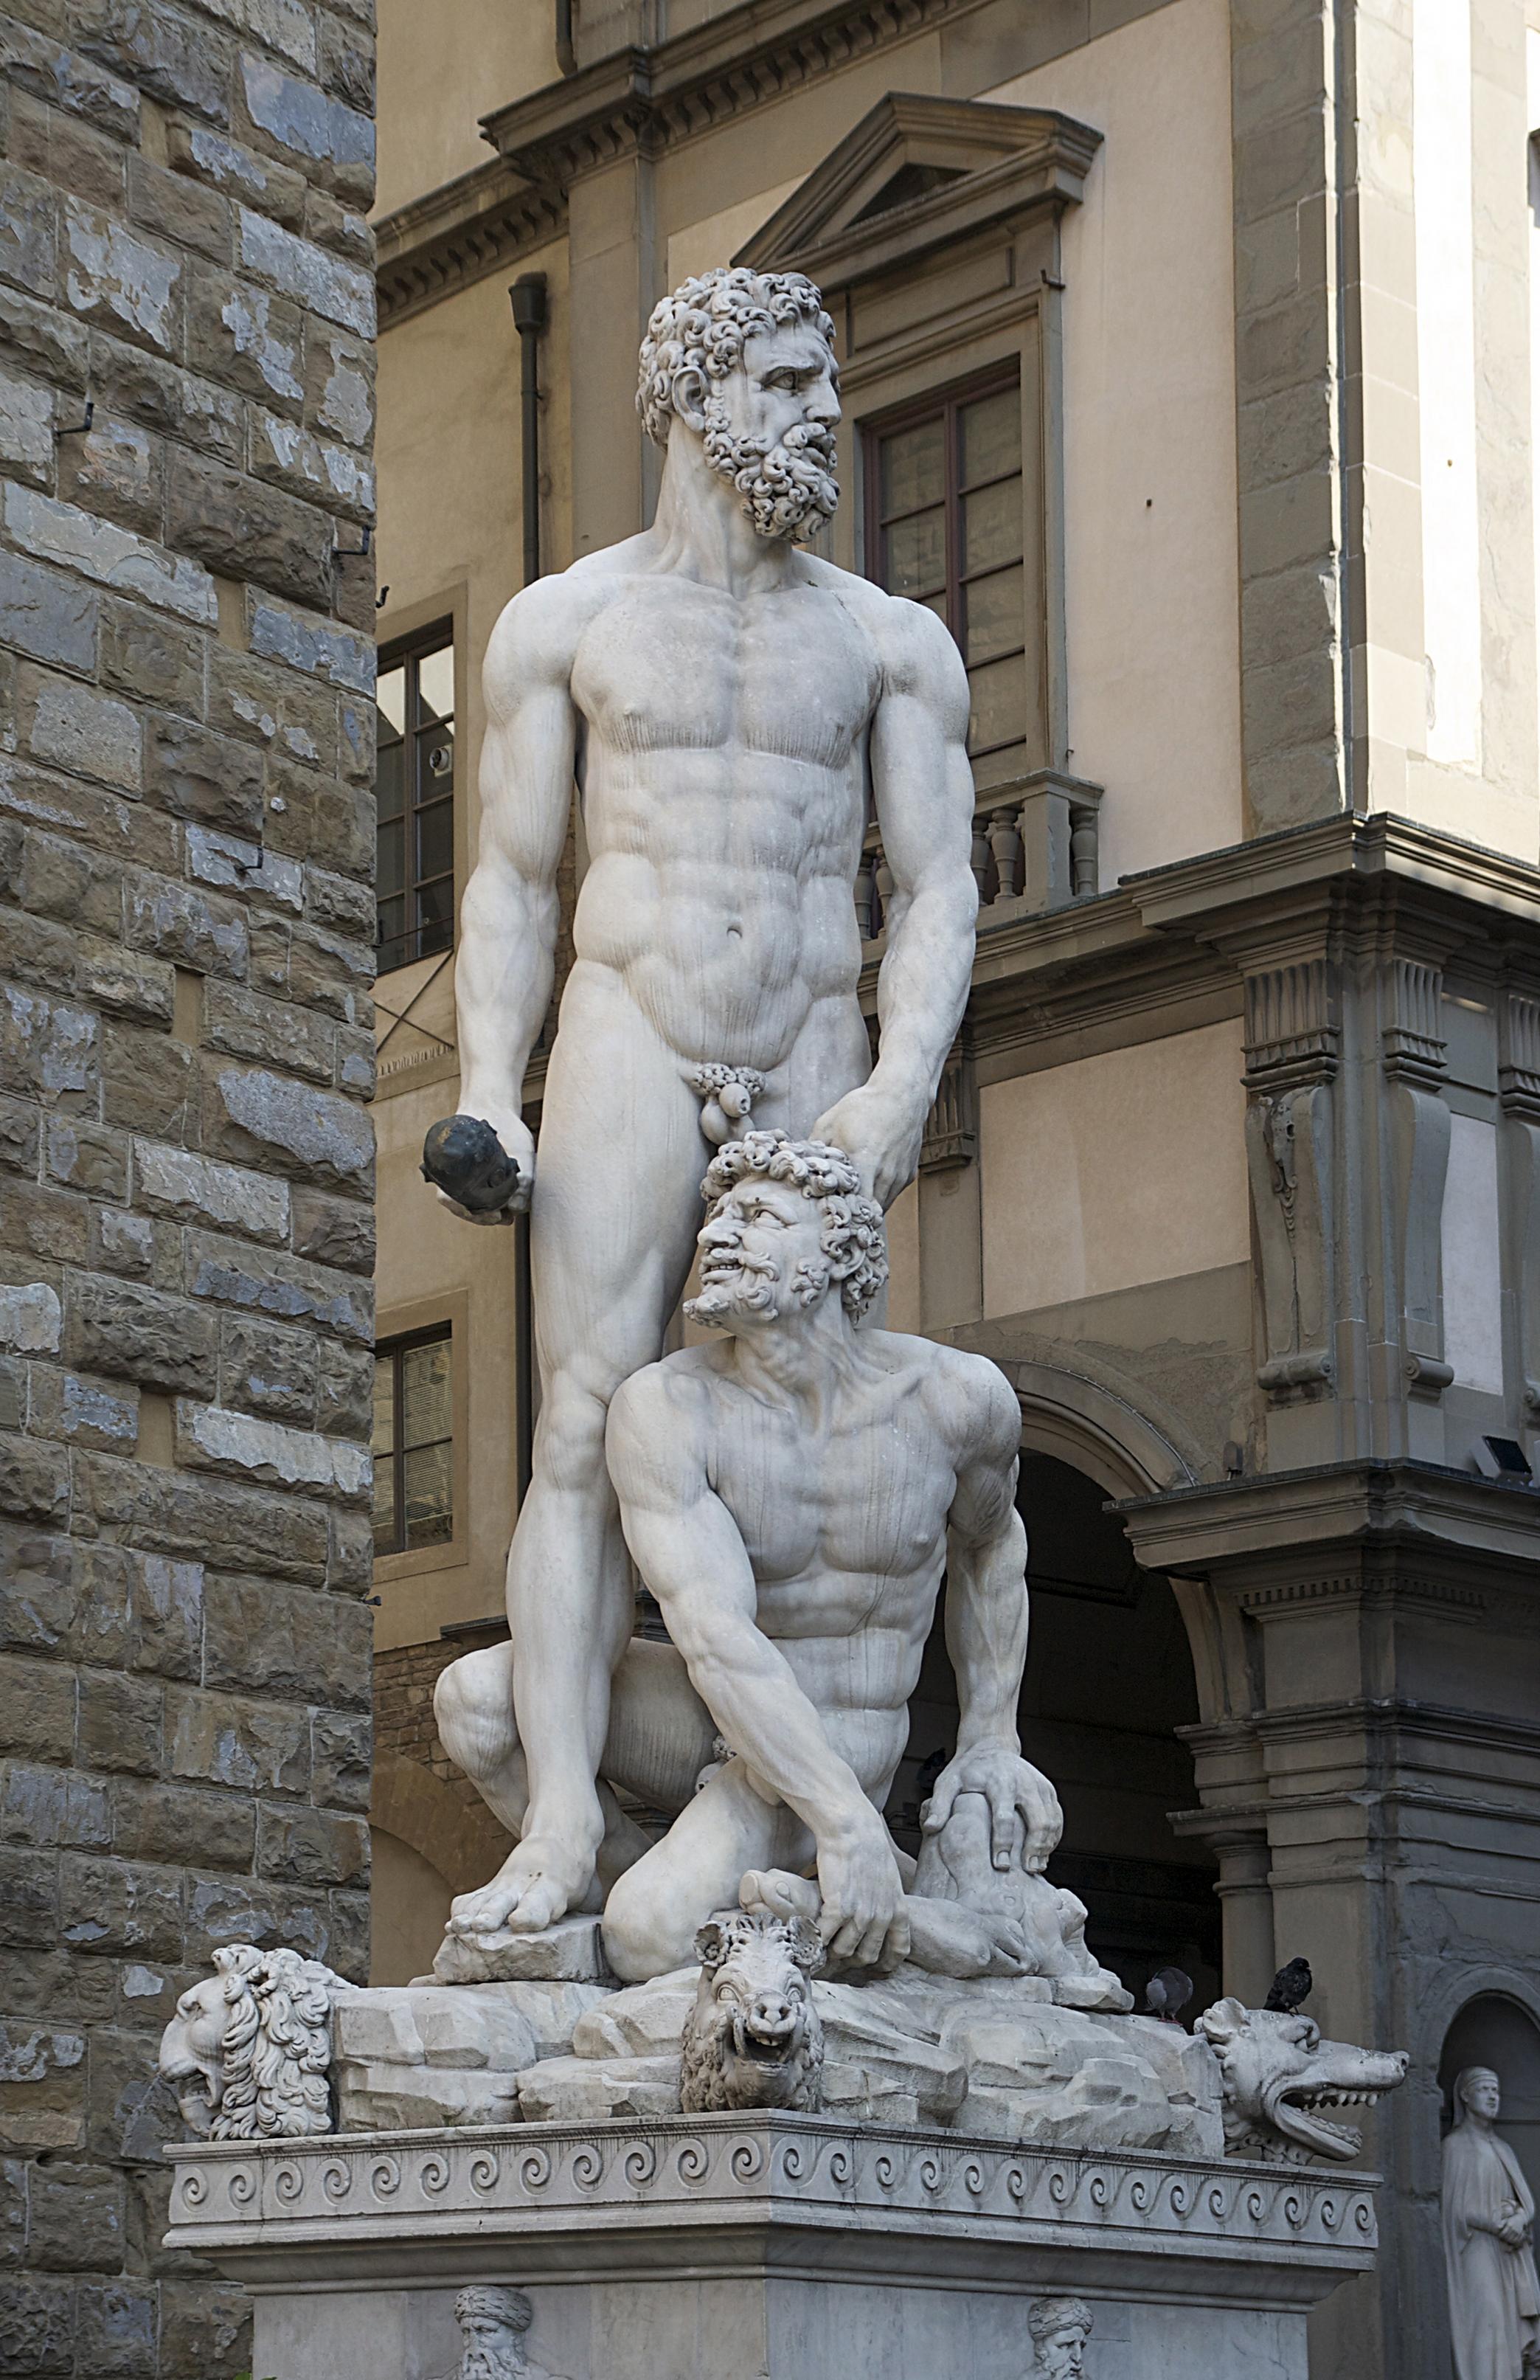 http://upload.wikimedia.org/wikipedia/commons/b/bf/Hercule_et_Cacus_Bandinelli_Florence_Signoria.jpg